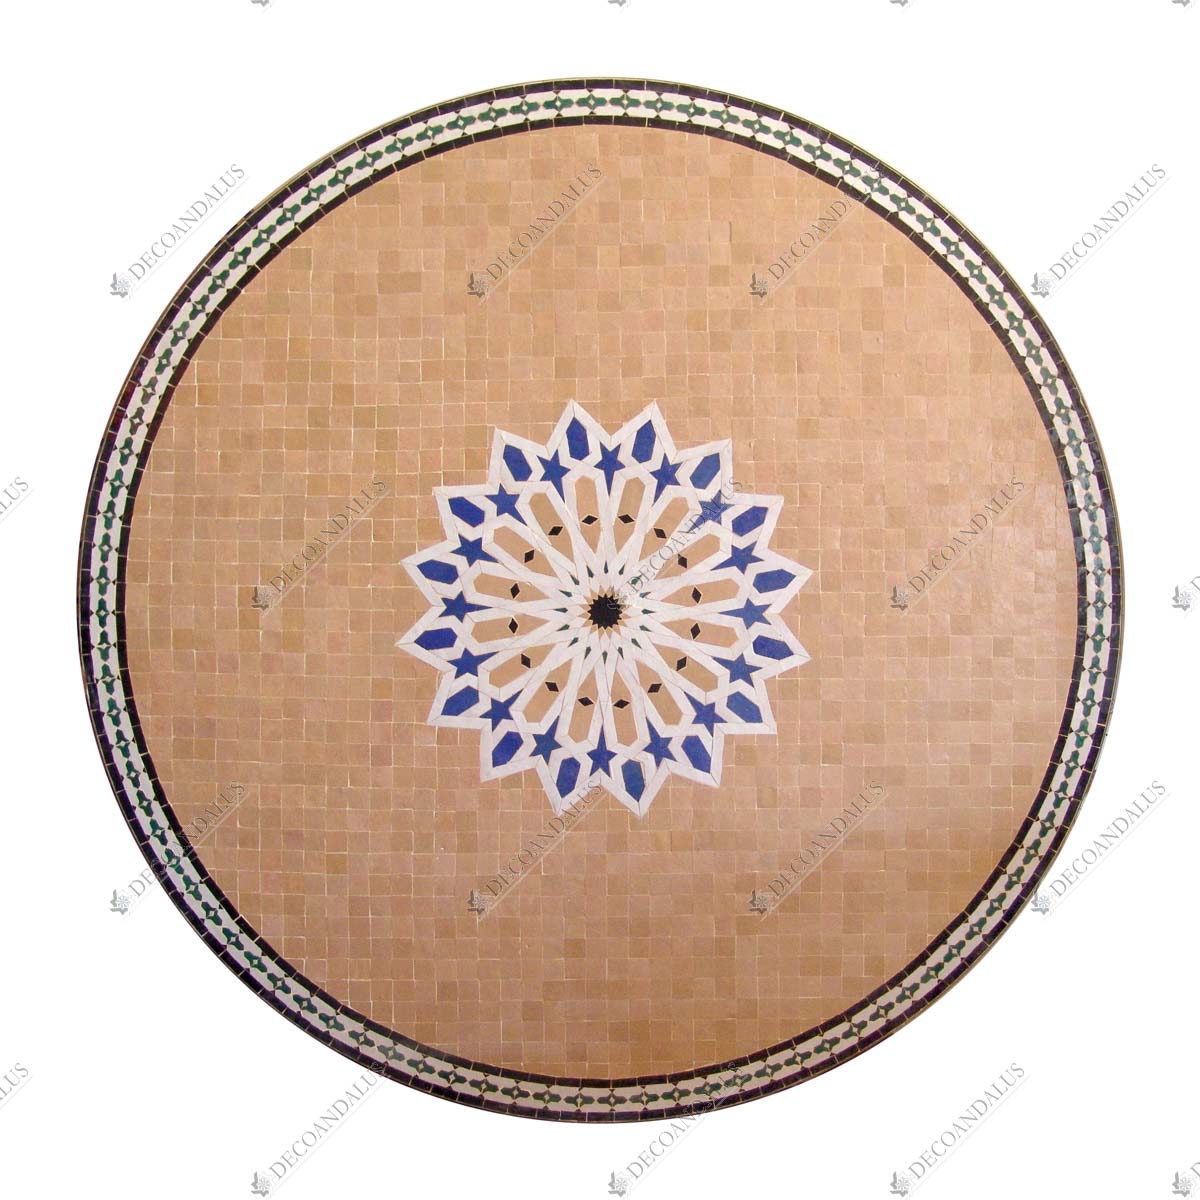 Mosaico cer mica mesas decorativas decoandalus for Mosaico ceramica